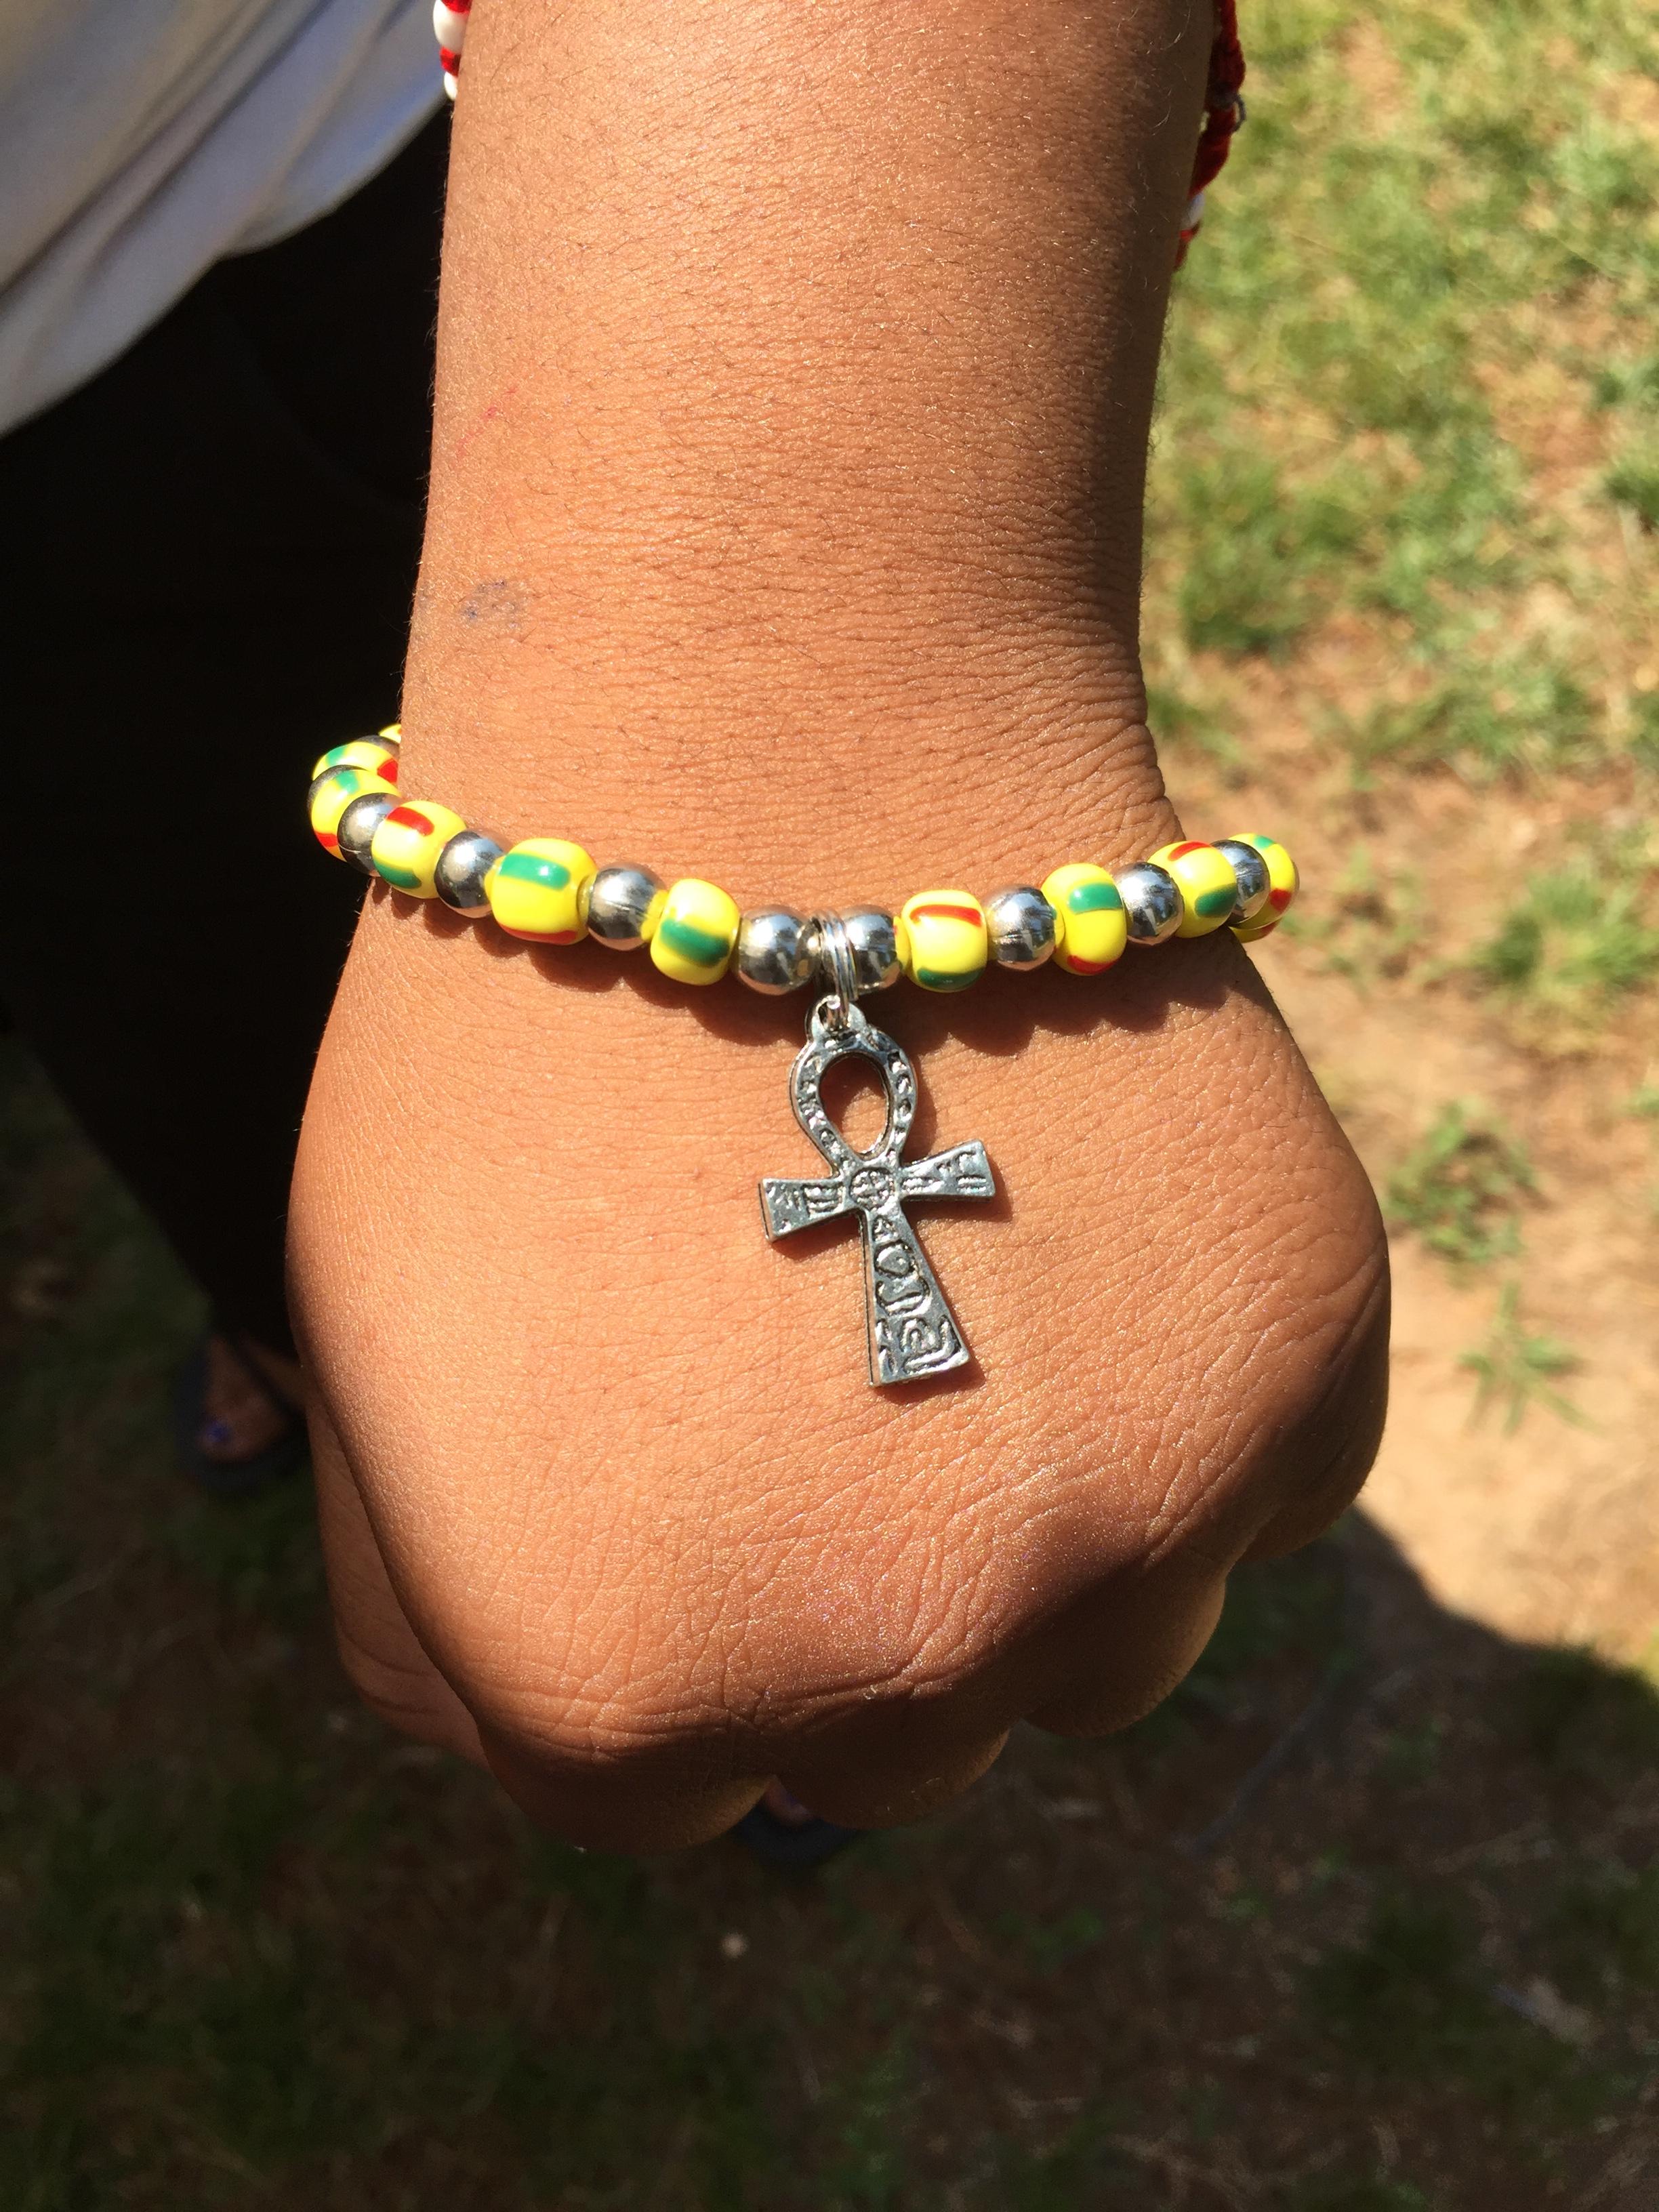 Native Nubian Jewelry Design